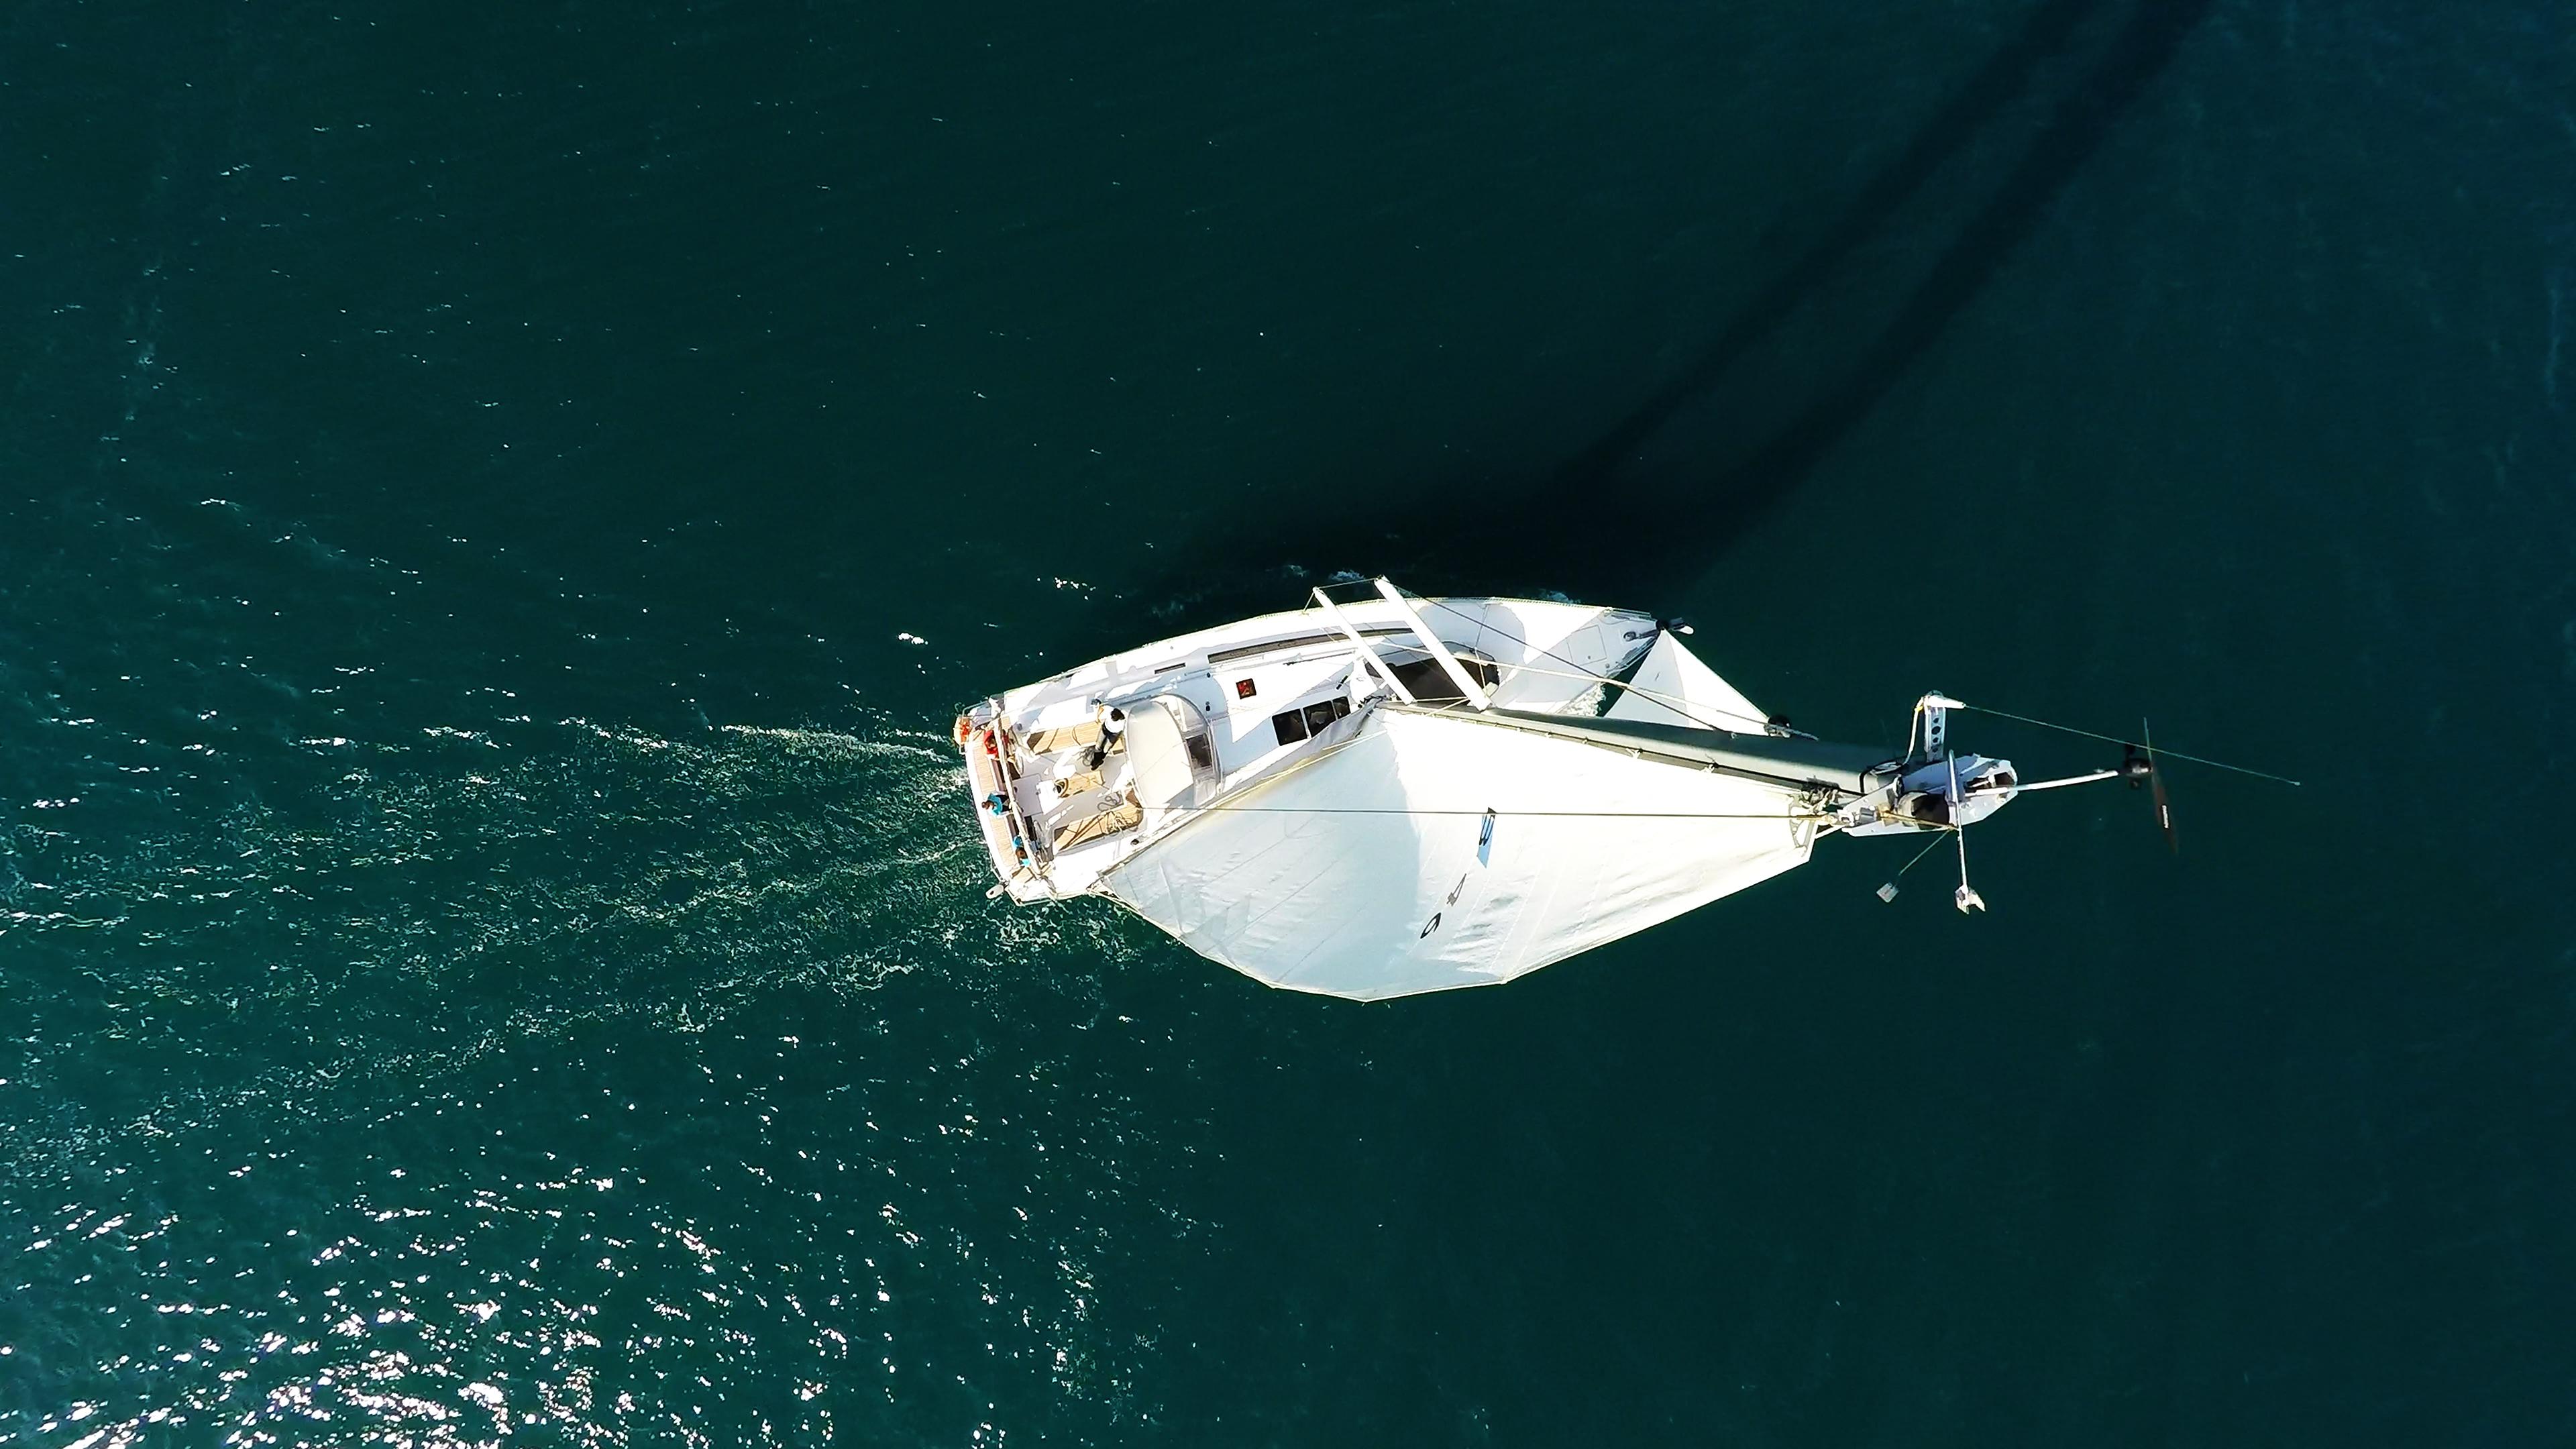 barcha a vela barca a vela nadir yacht a vela cima dell'albero